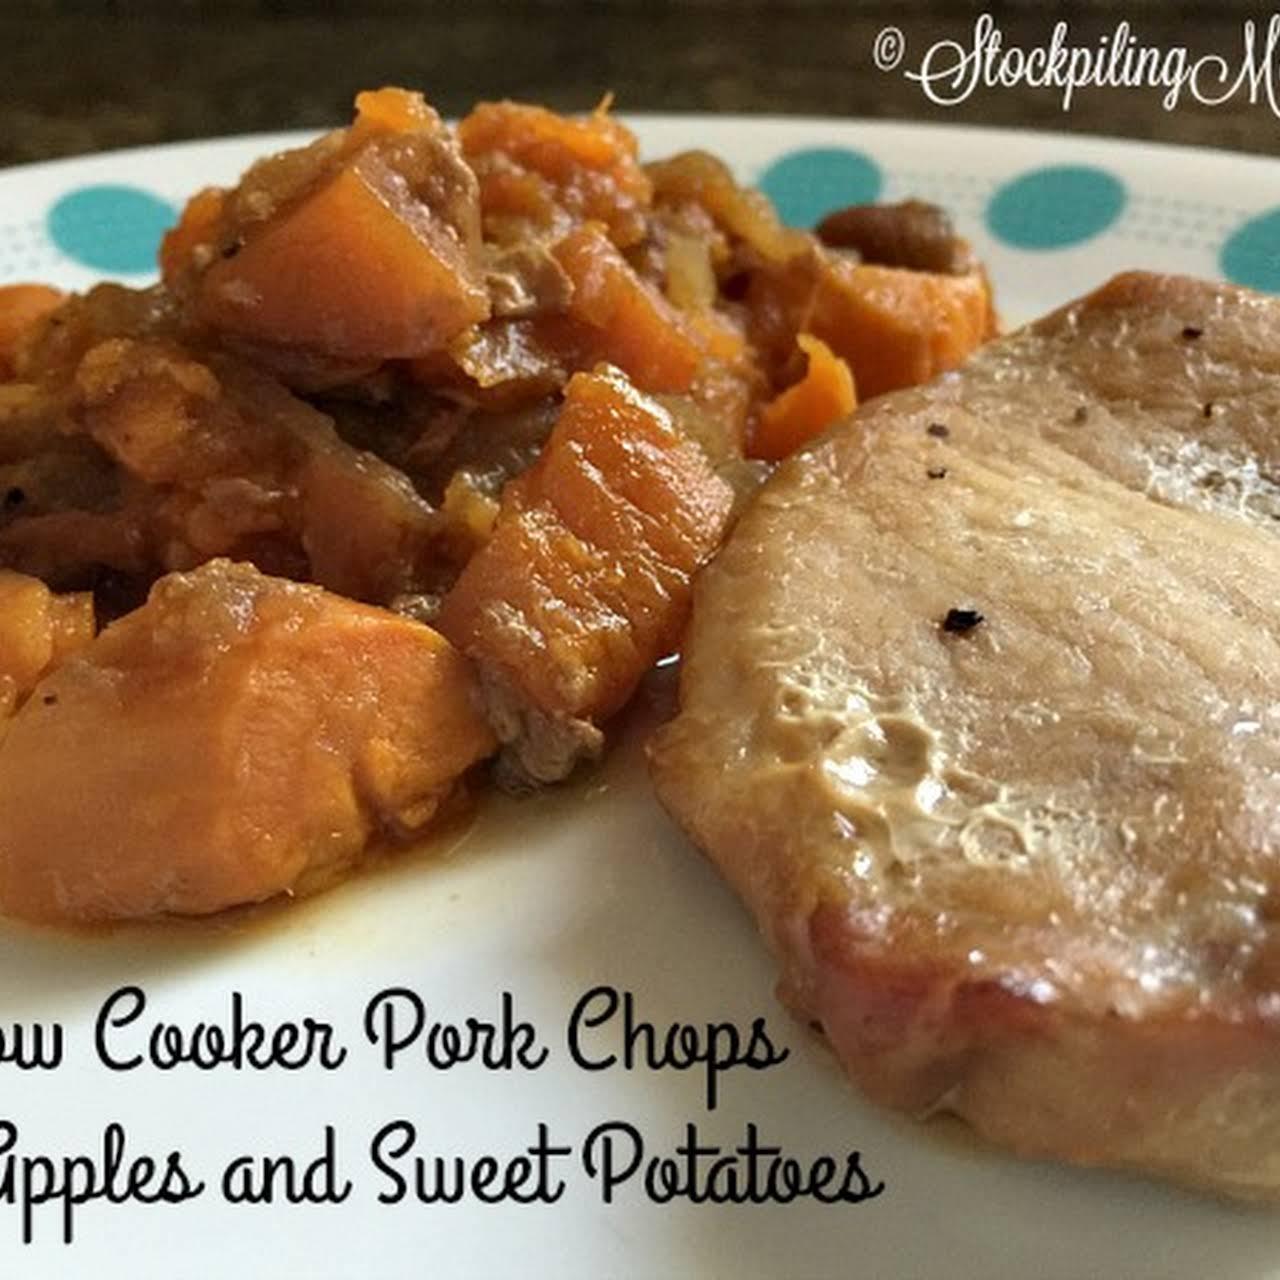 pork chop sweet potato crock pot recipe Slow Cooker Pork Chops With Apples and Sweet Potatoes